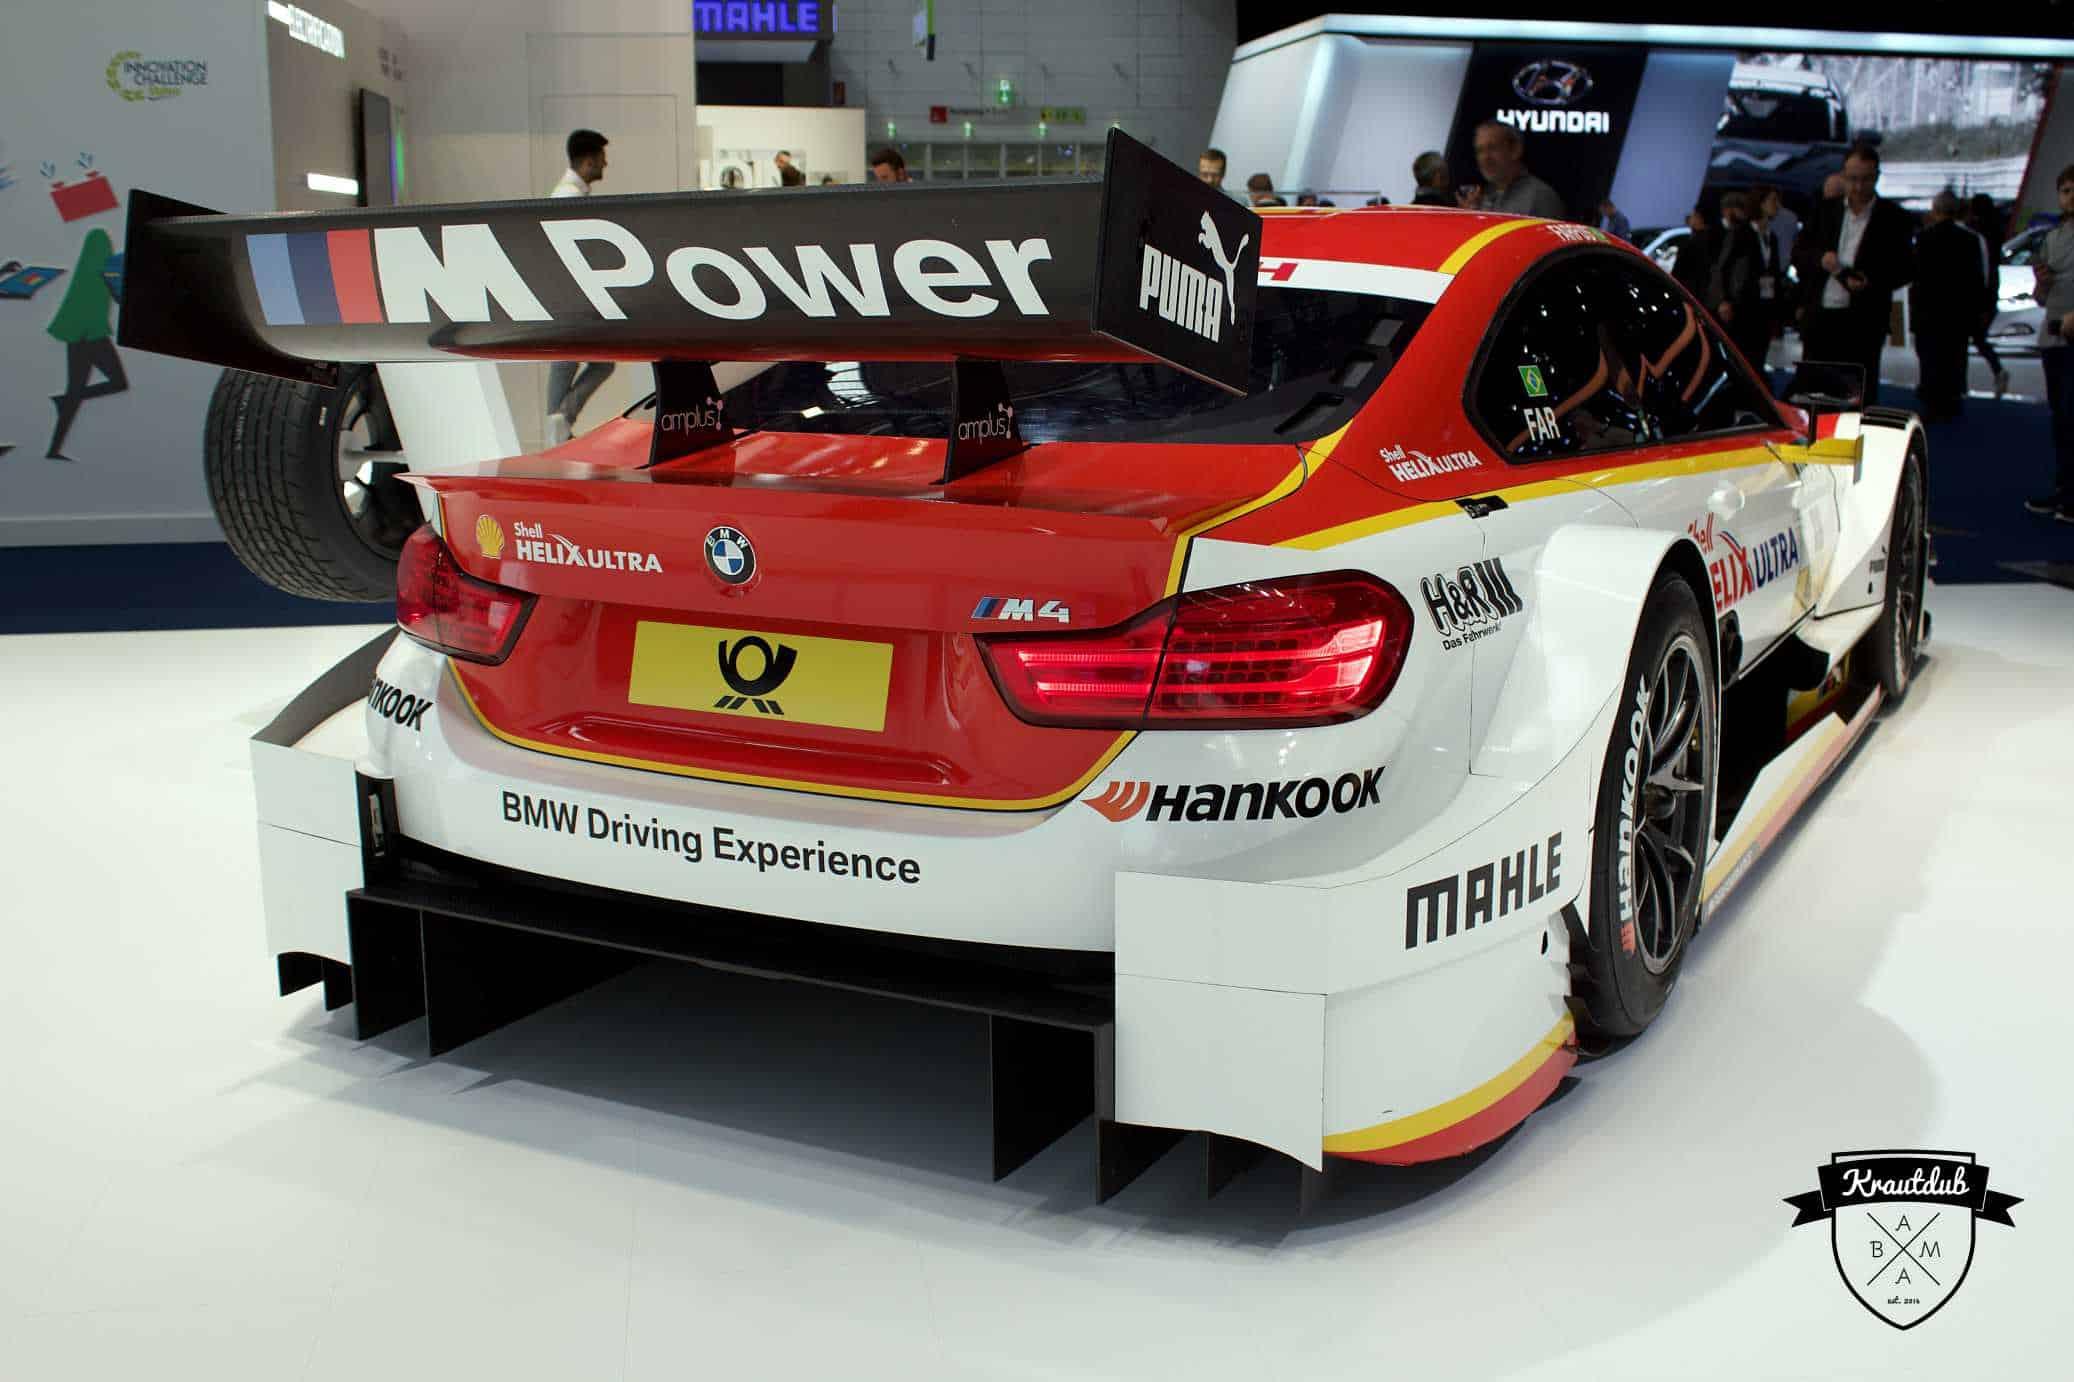 BMW Shell M4 DTM von Augusto Farfus - IAA 2017